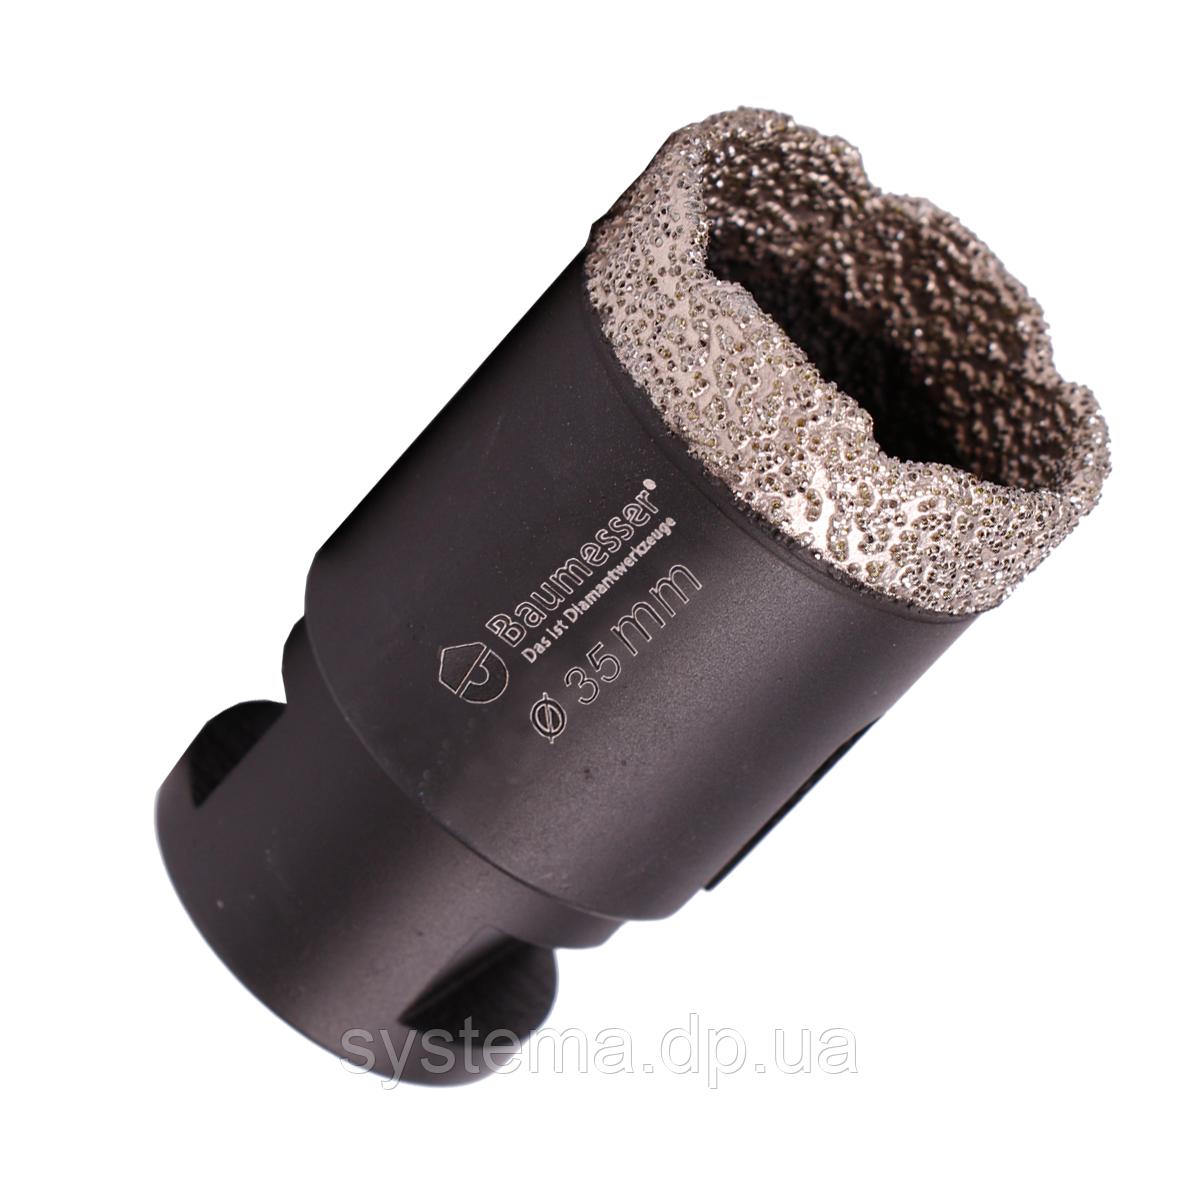 Алмазне свердло DDR-V 35x30xM14 Keramik Pro